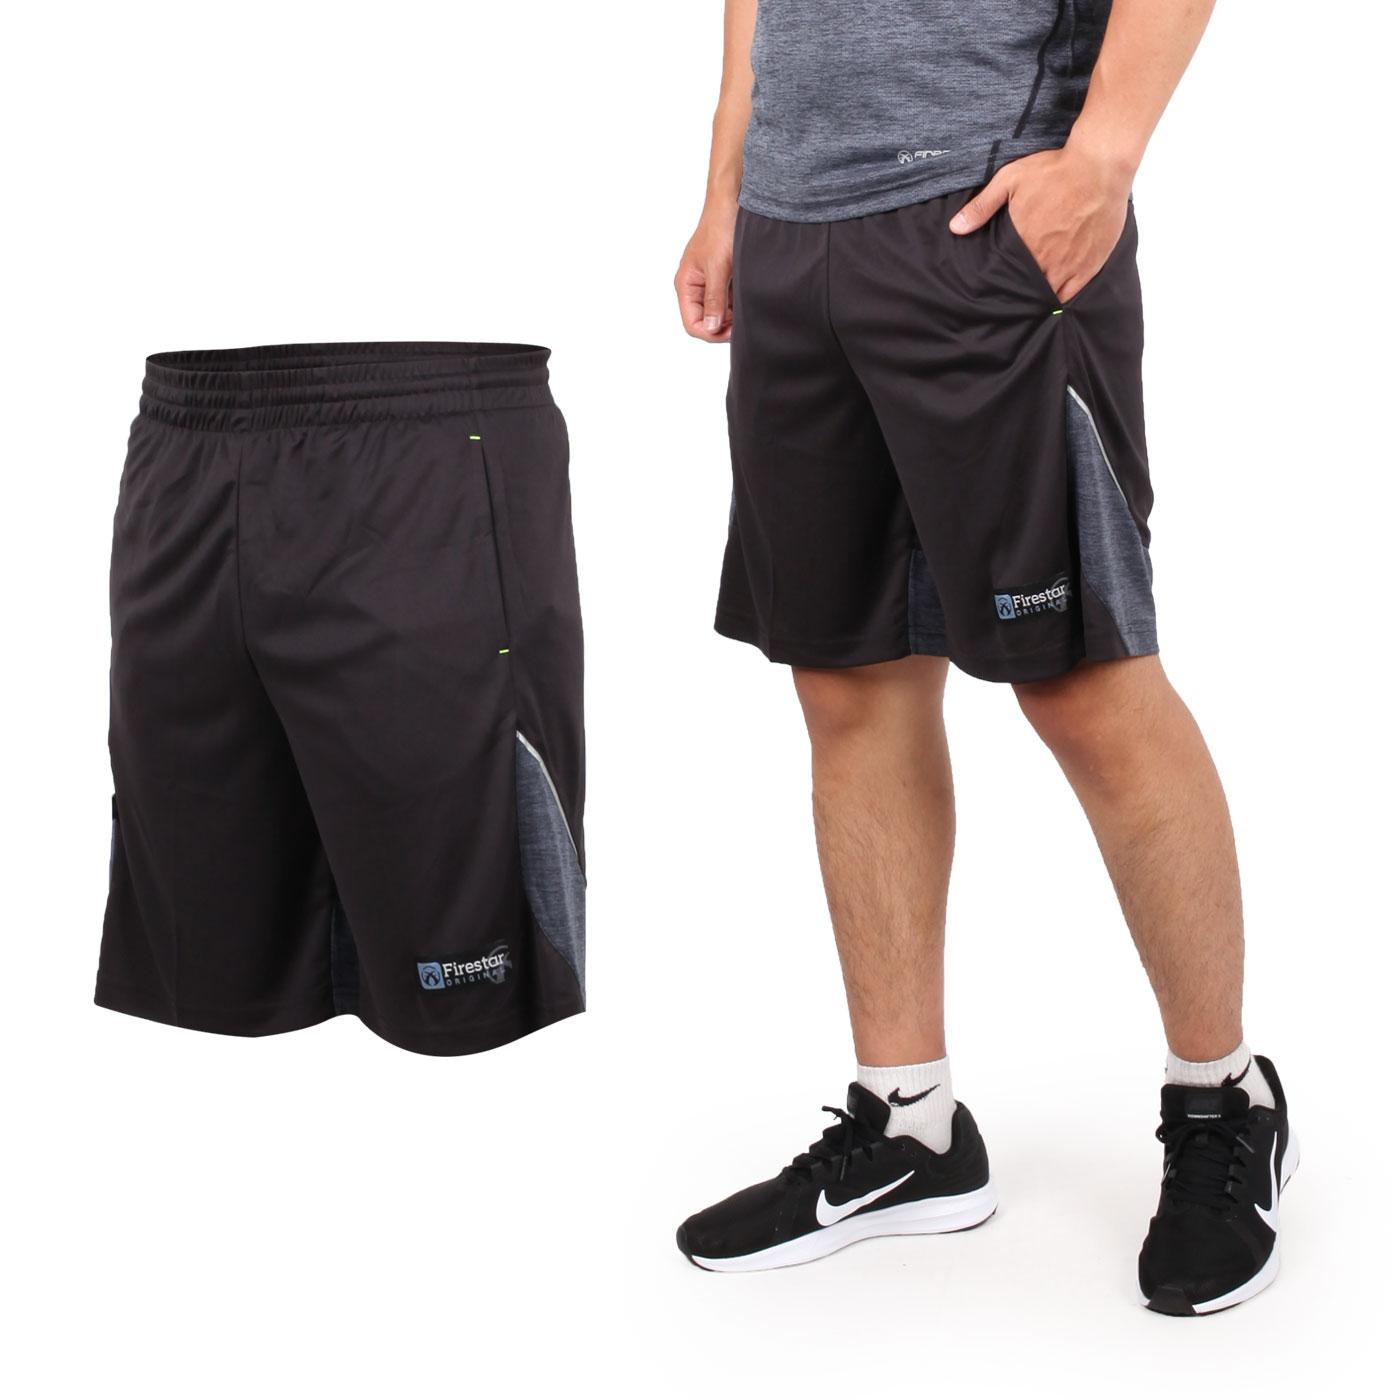 FIRESTAR 男針織籃球短褲 B8003-18 - 黑灰